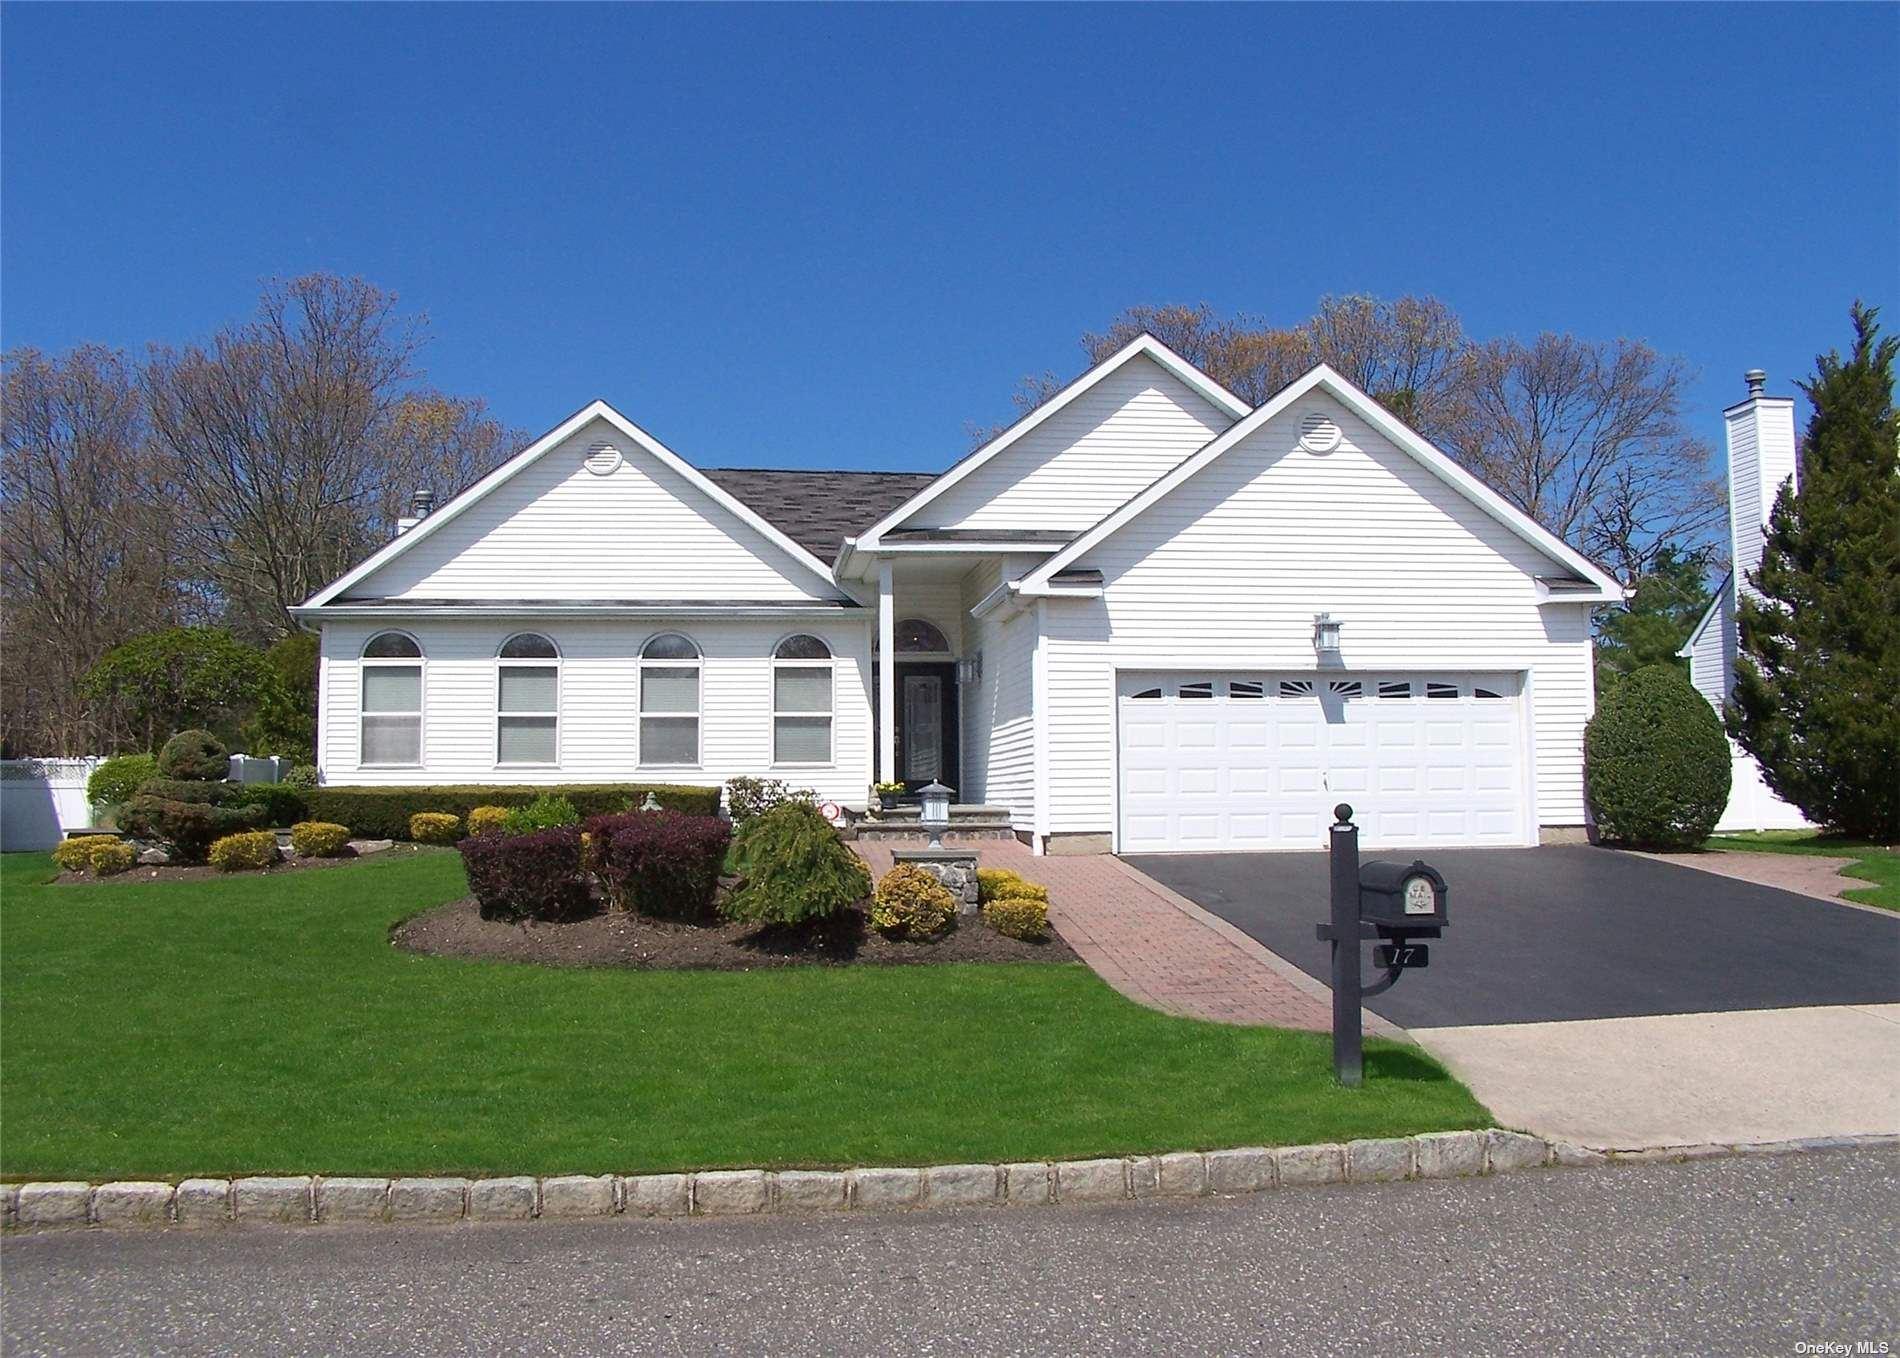 17 Summerfield Drive, Holtsville, NY 11742 - MLS#: 3307821